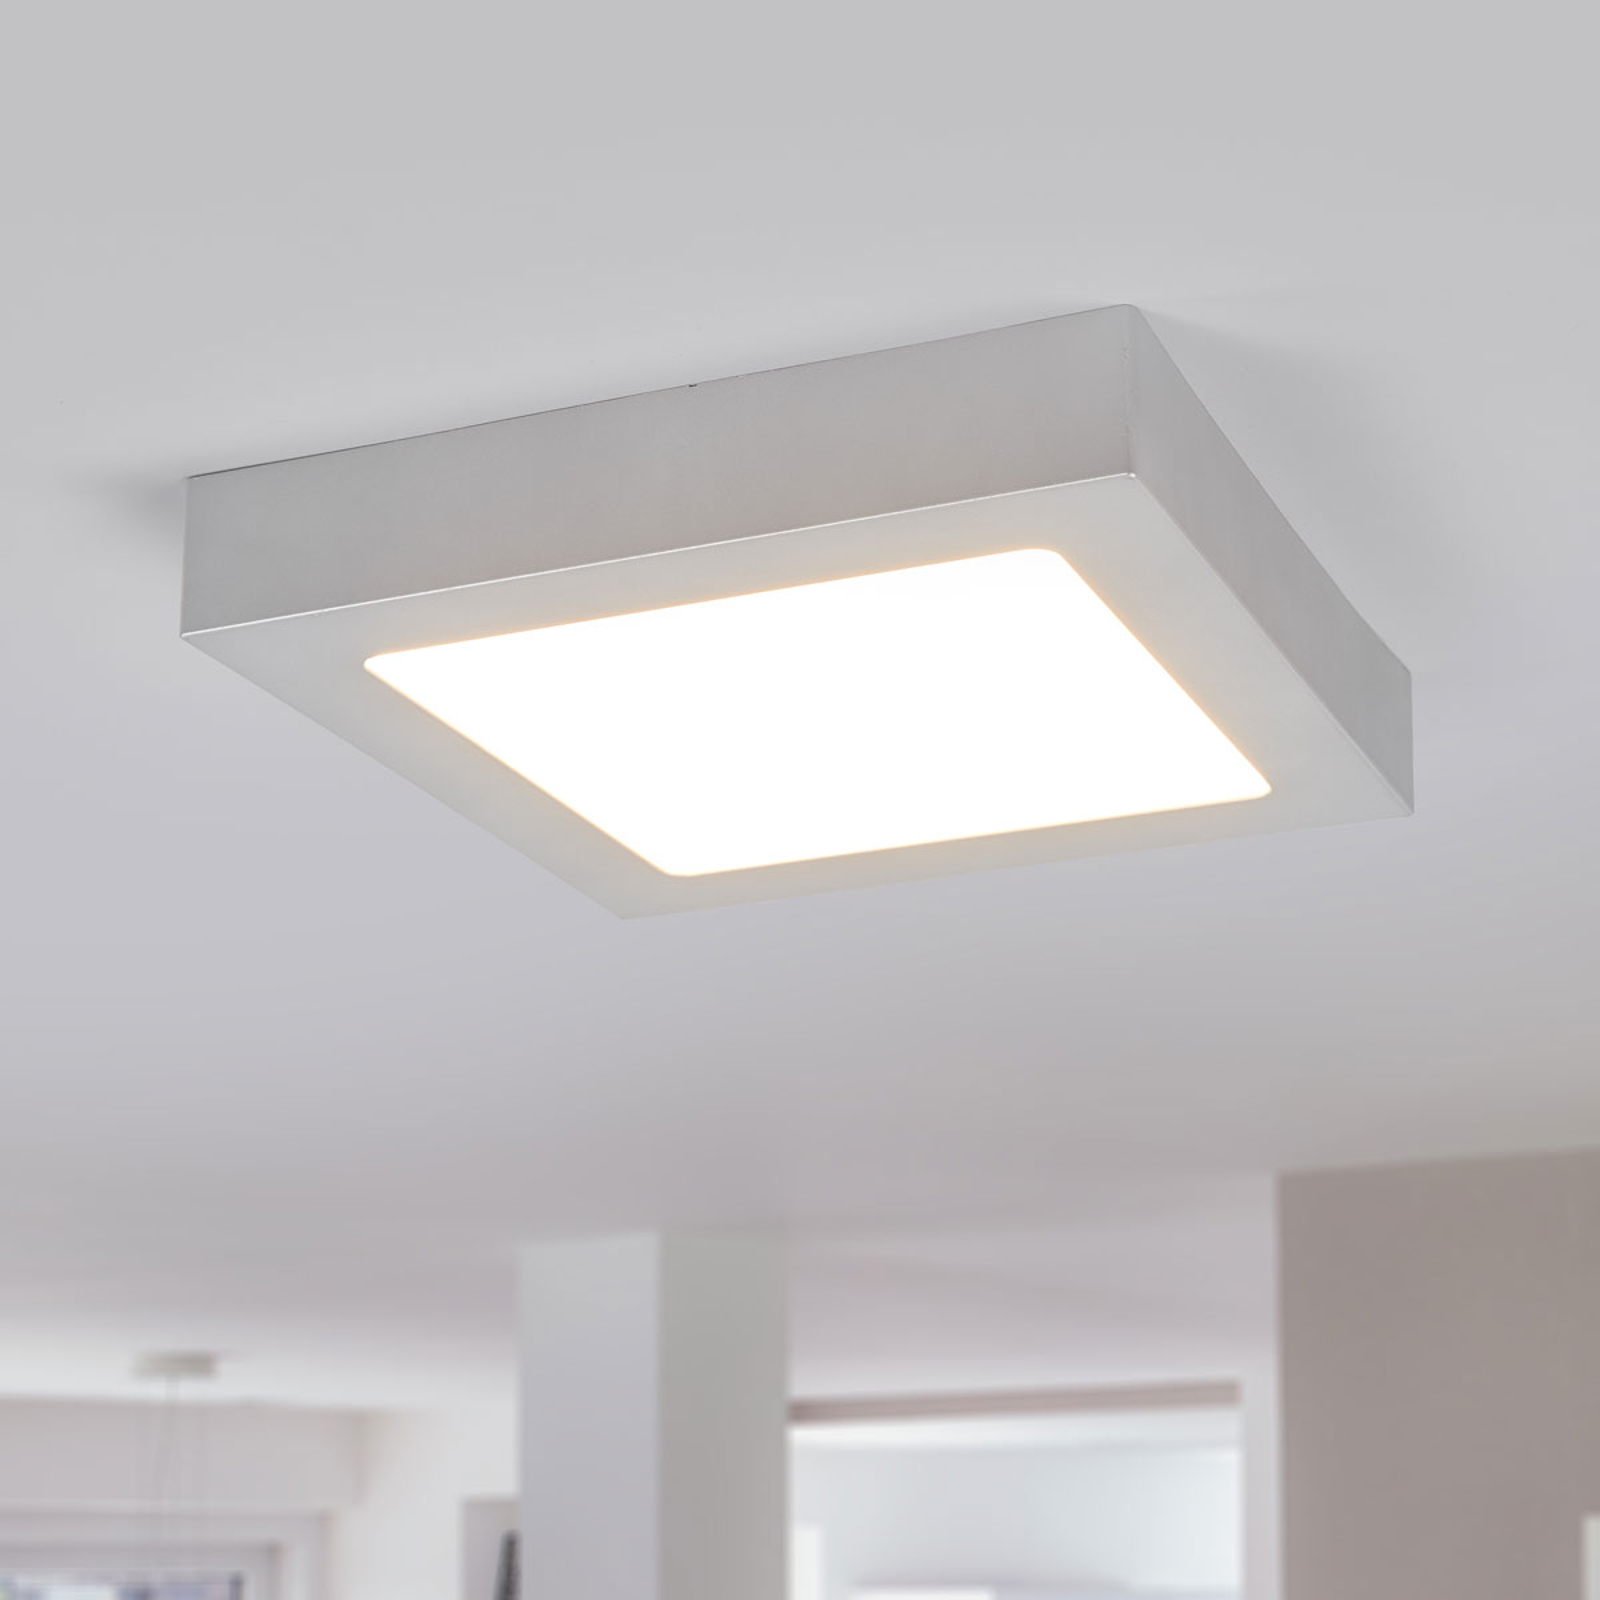 Lampa LED Marlo srebrna 3000K kątowa 23,1cm